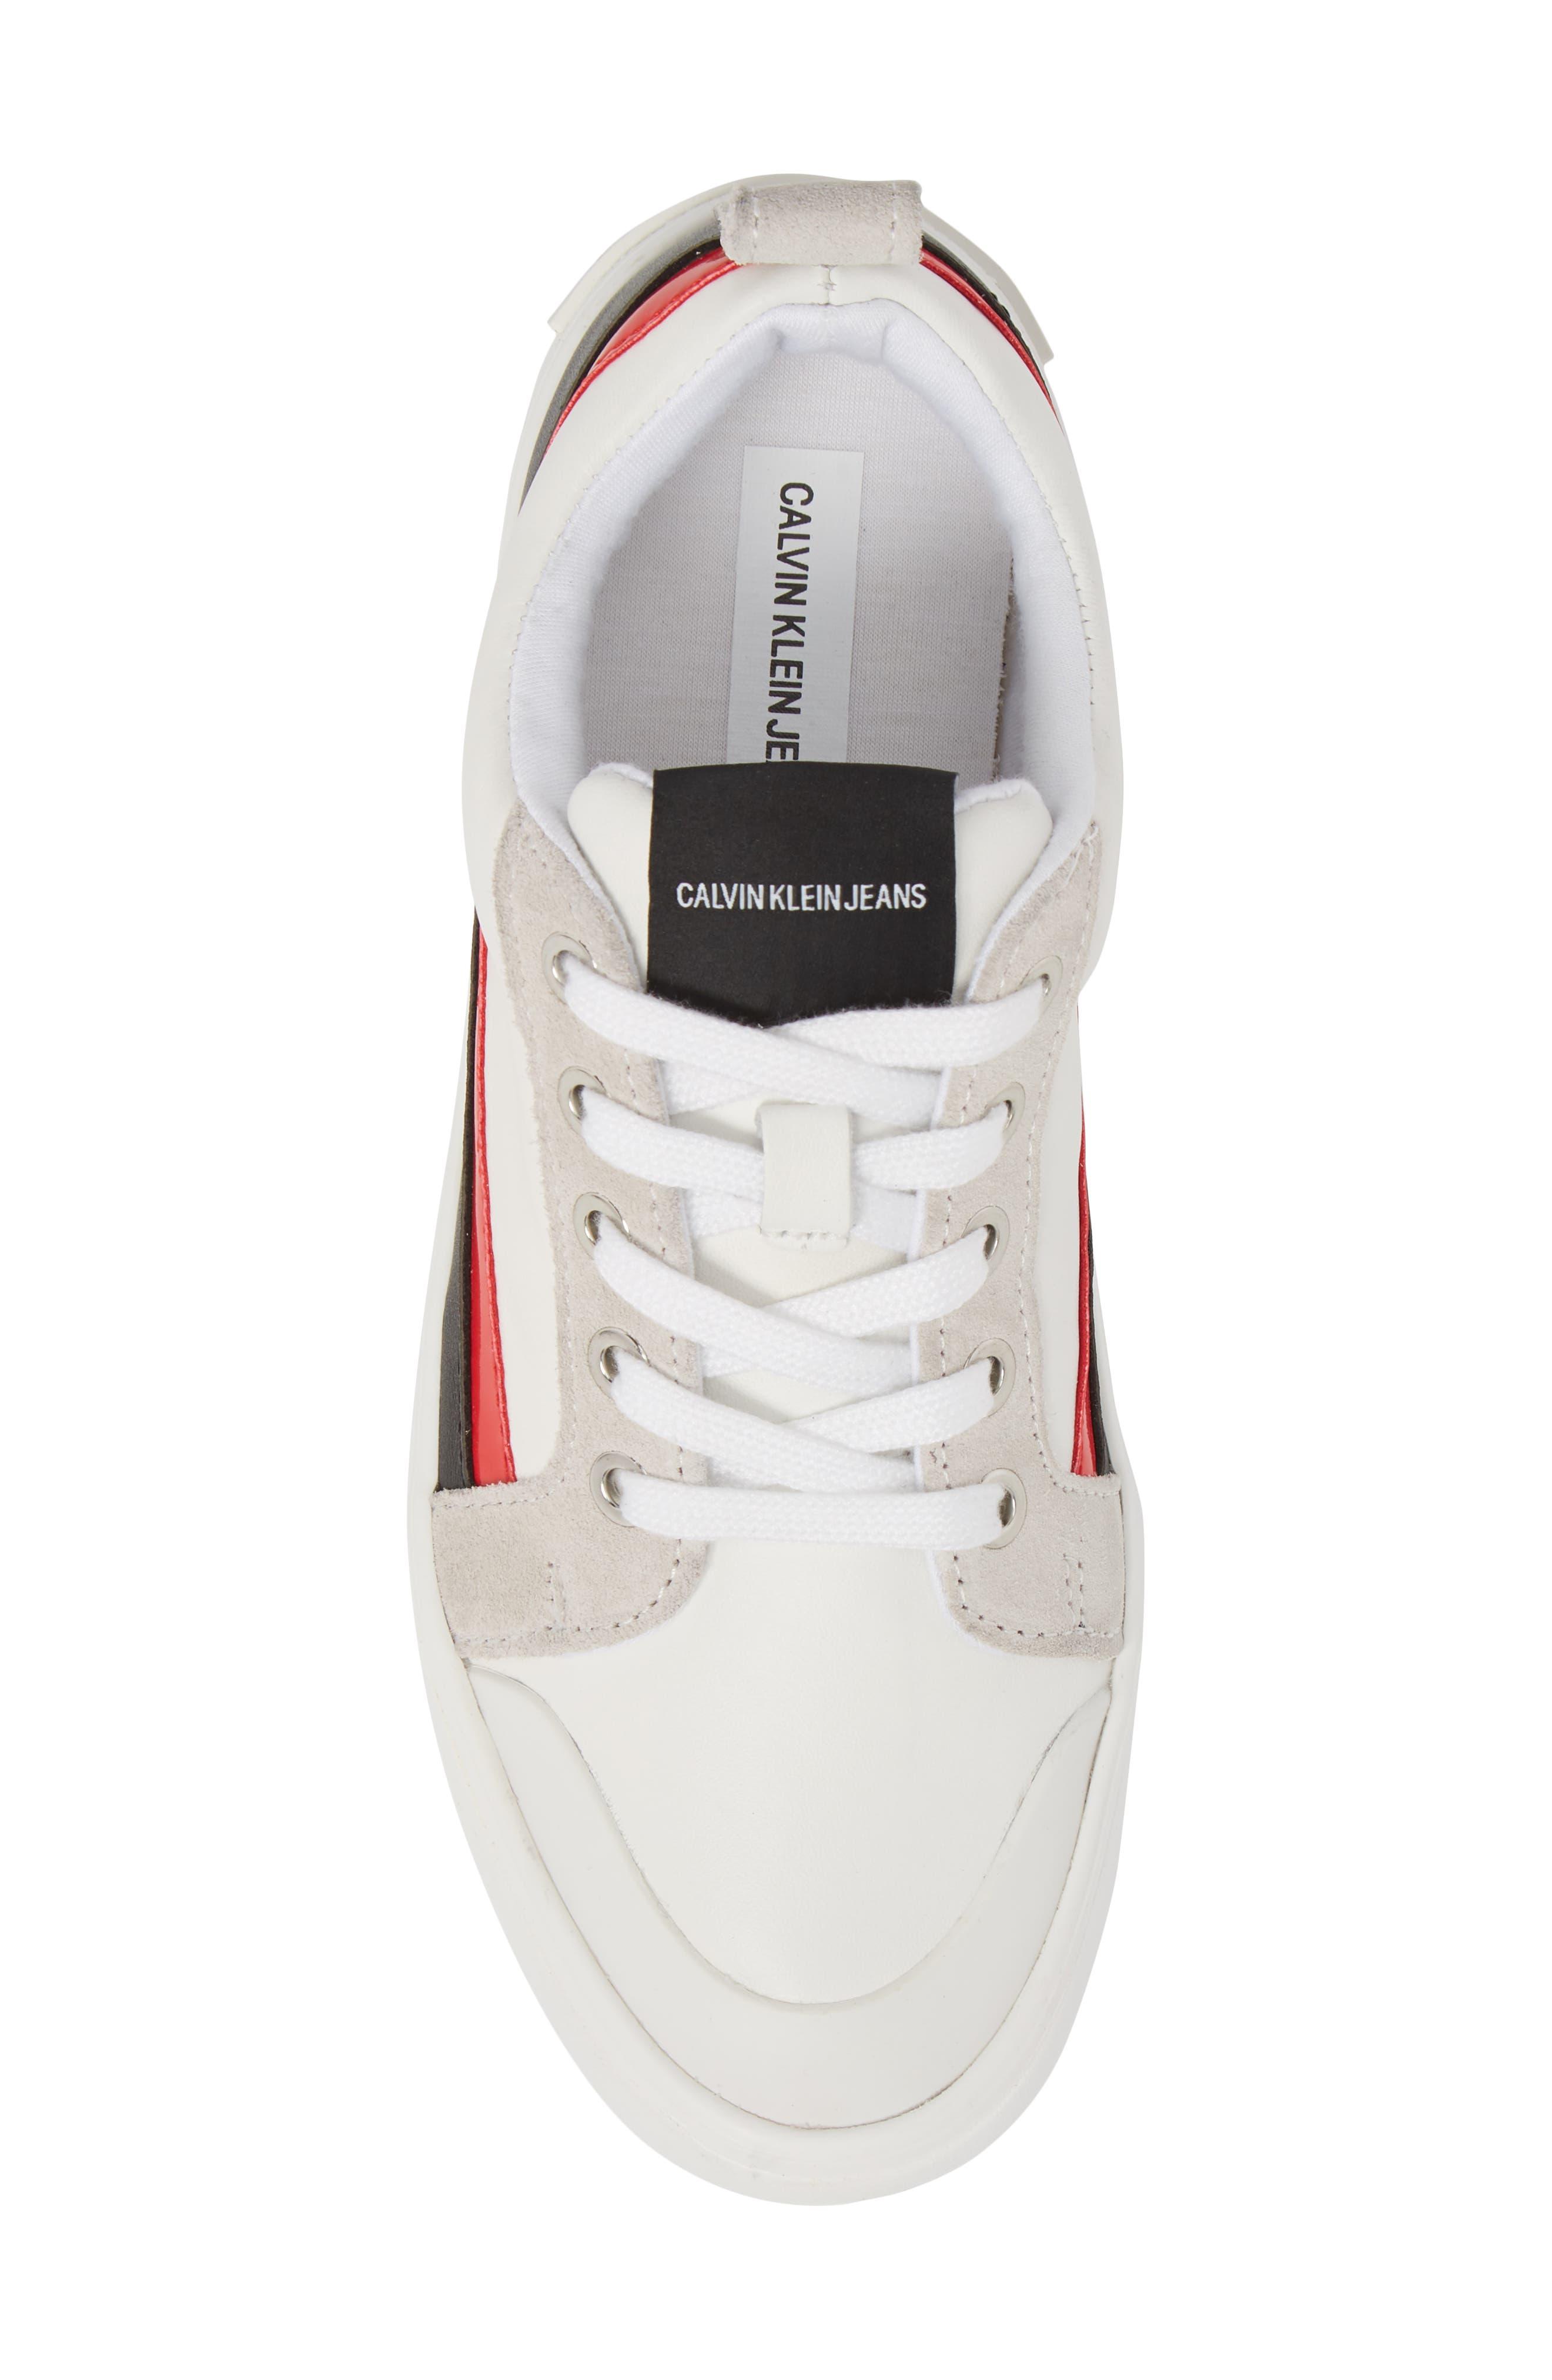 Dodie Sneaker,                             Alternate thumbnail 5, color,                             WHITE/ BLACK/ TOMATO